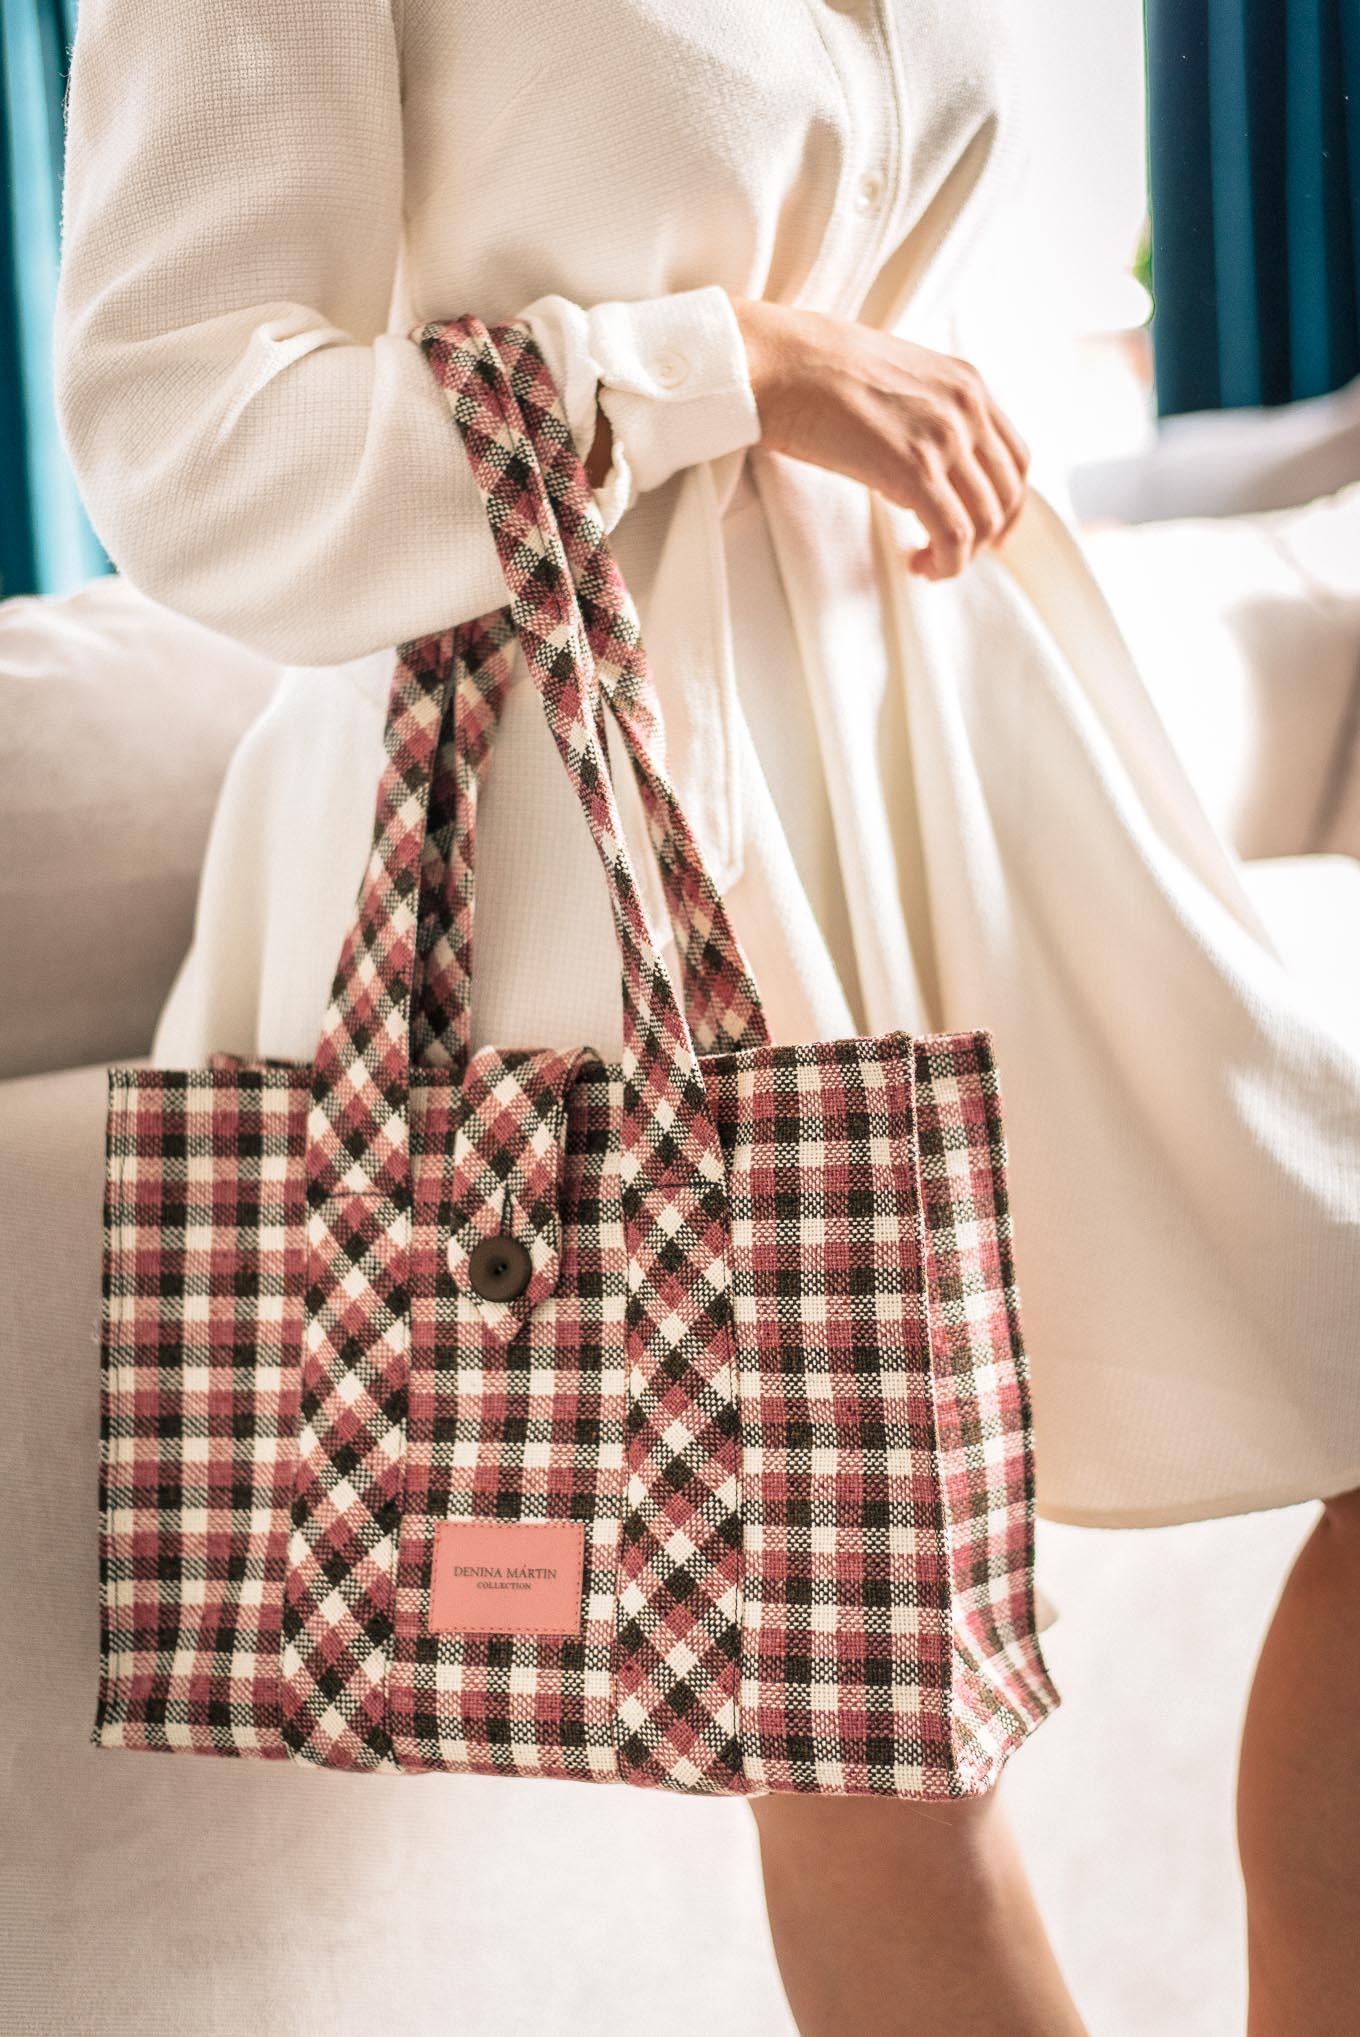 Denina Martin Collection handbag autumn style 2021